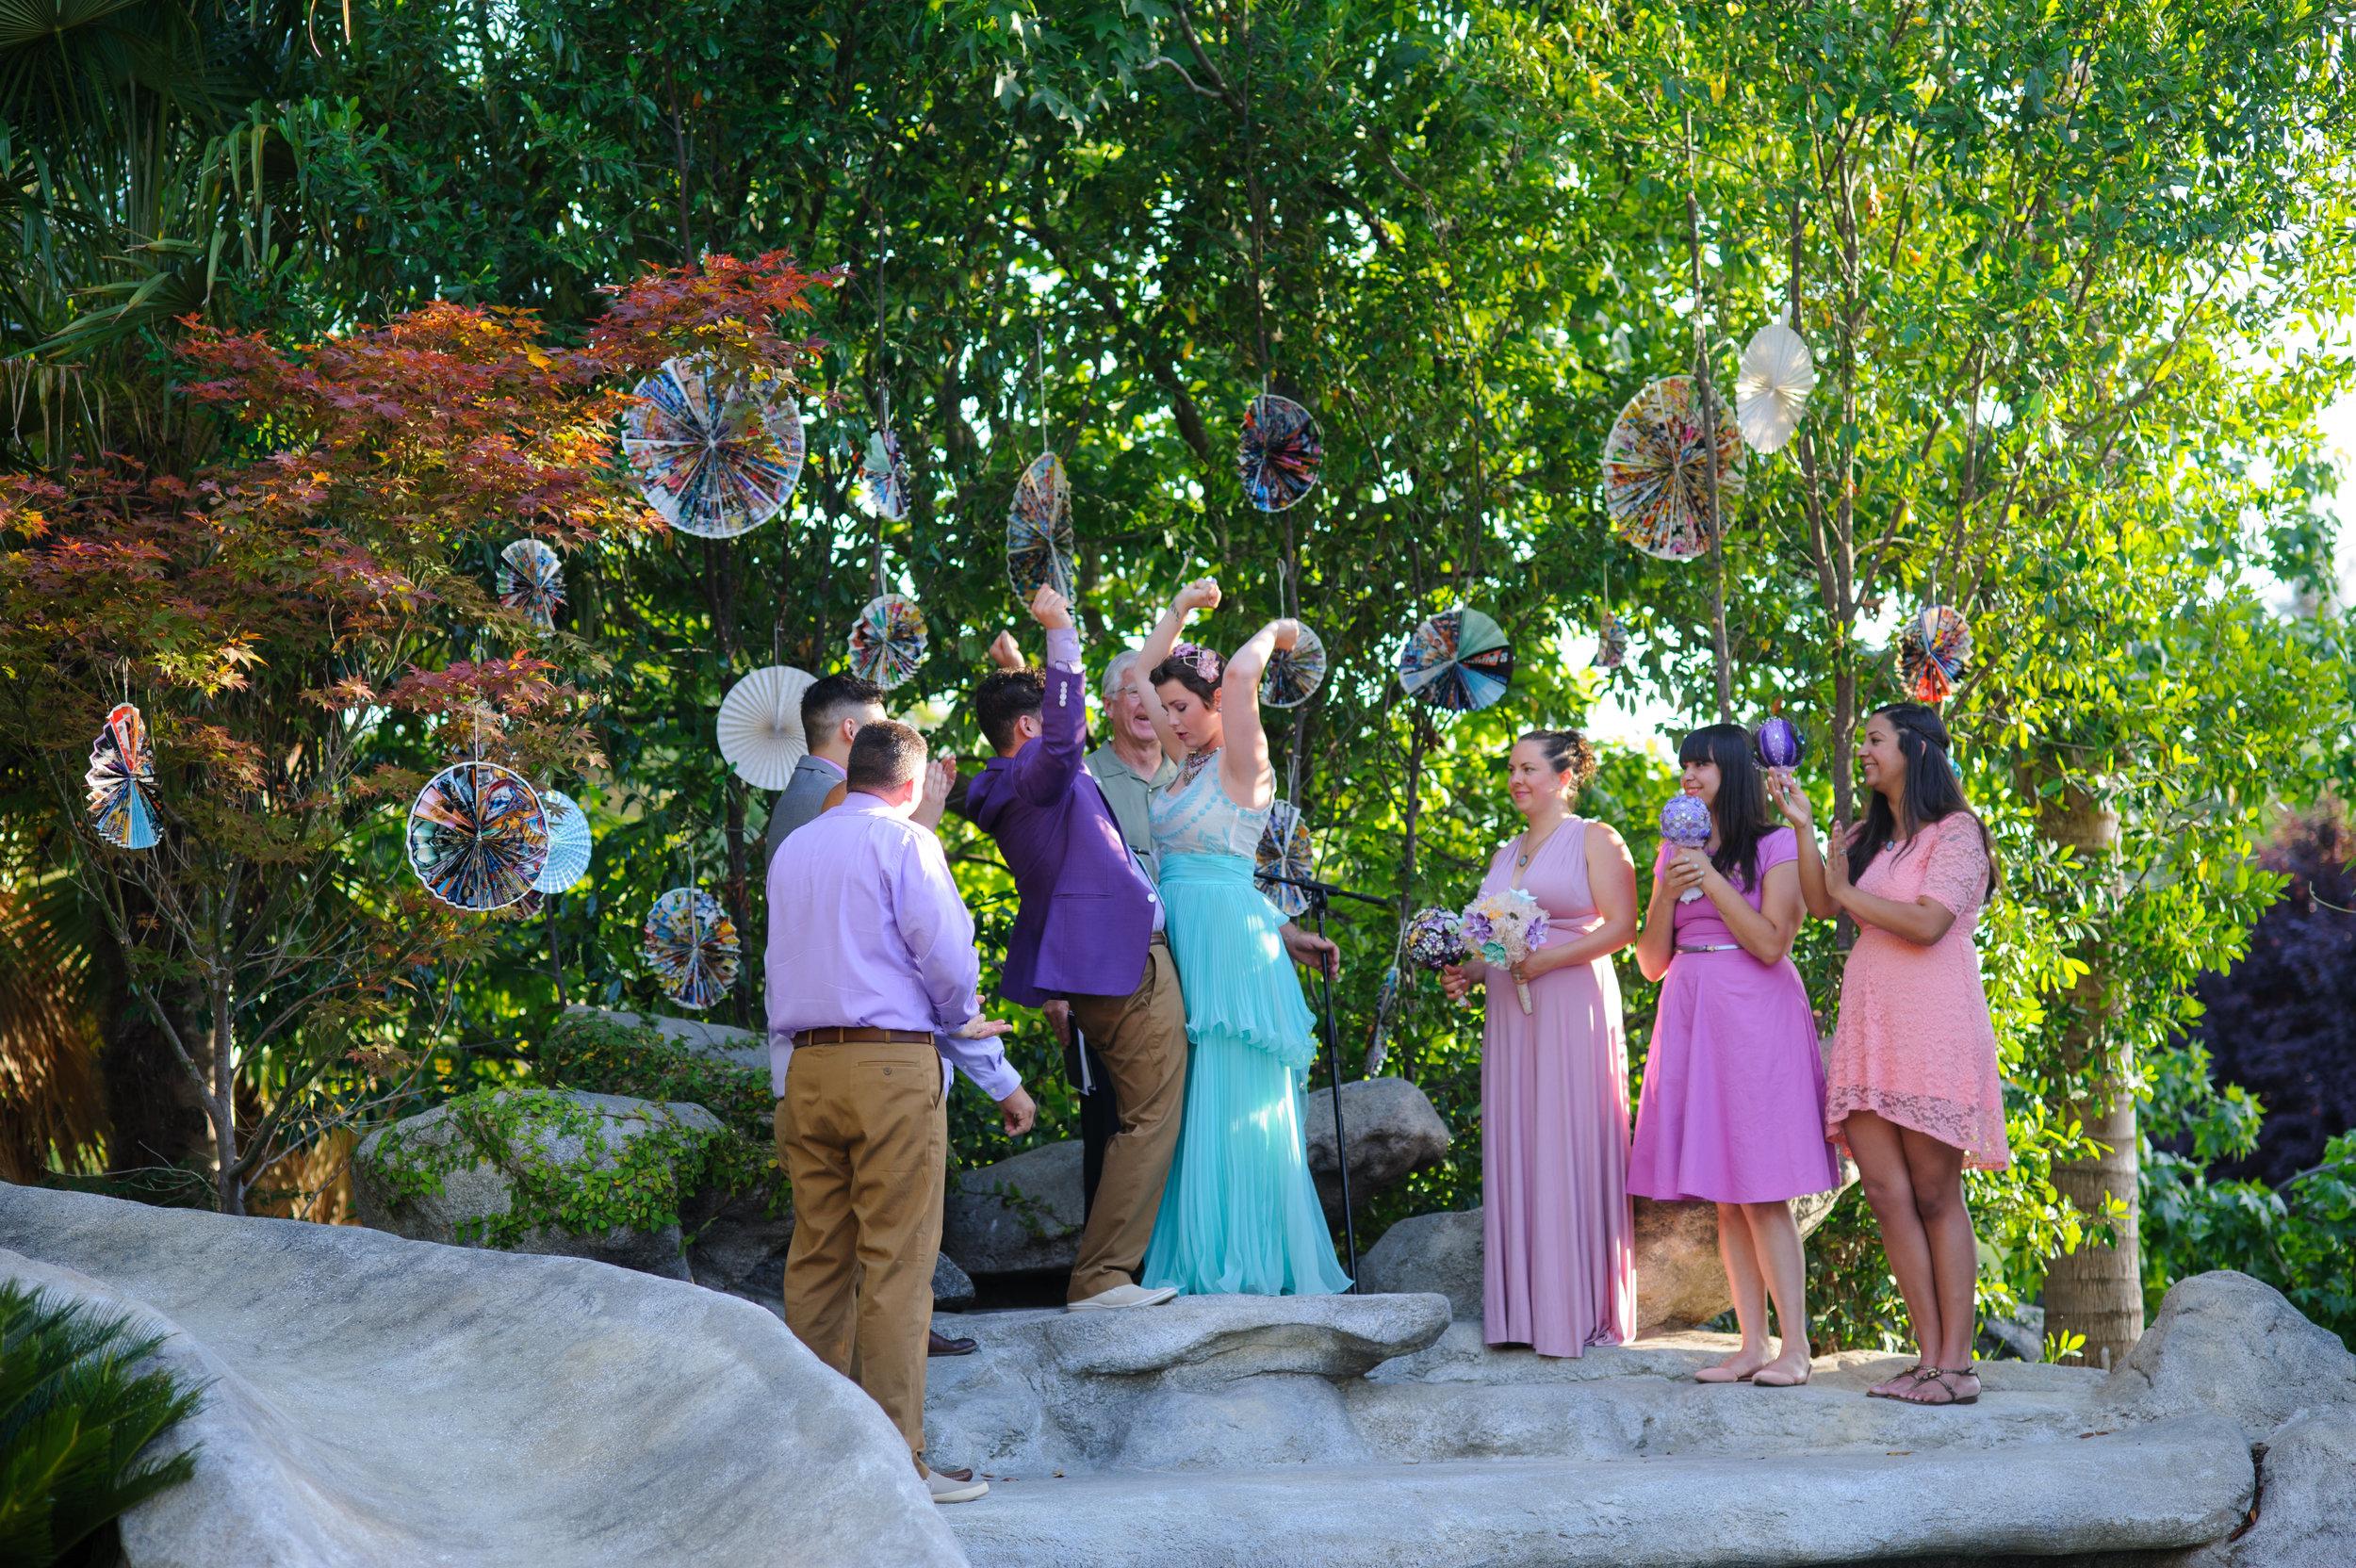 chloe-evan-025-backyard-sacramento-wedding-photographer-katherine-nicole-photography.JPG